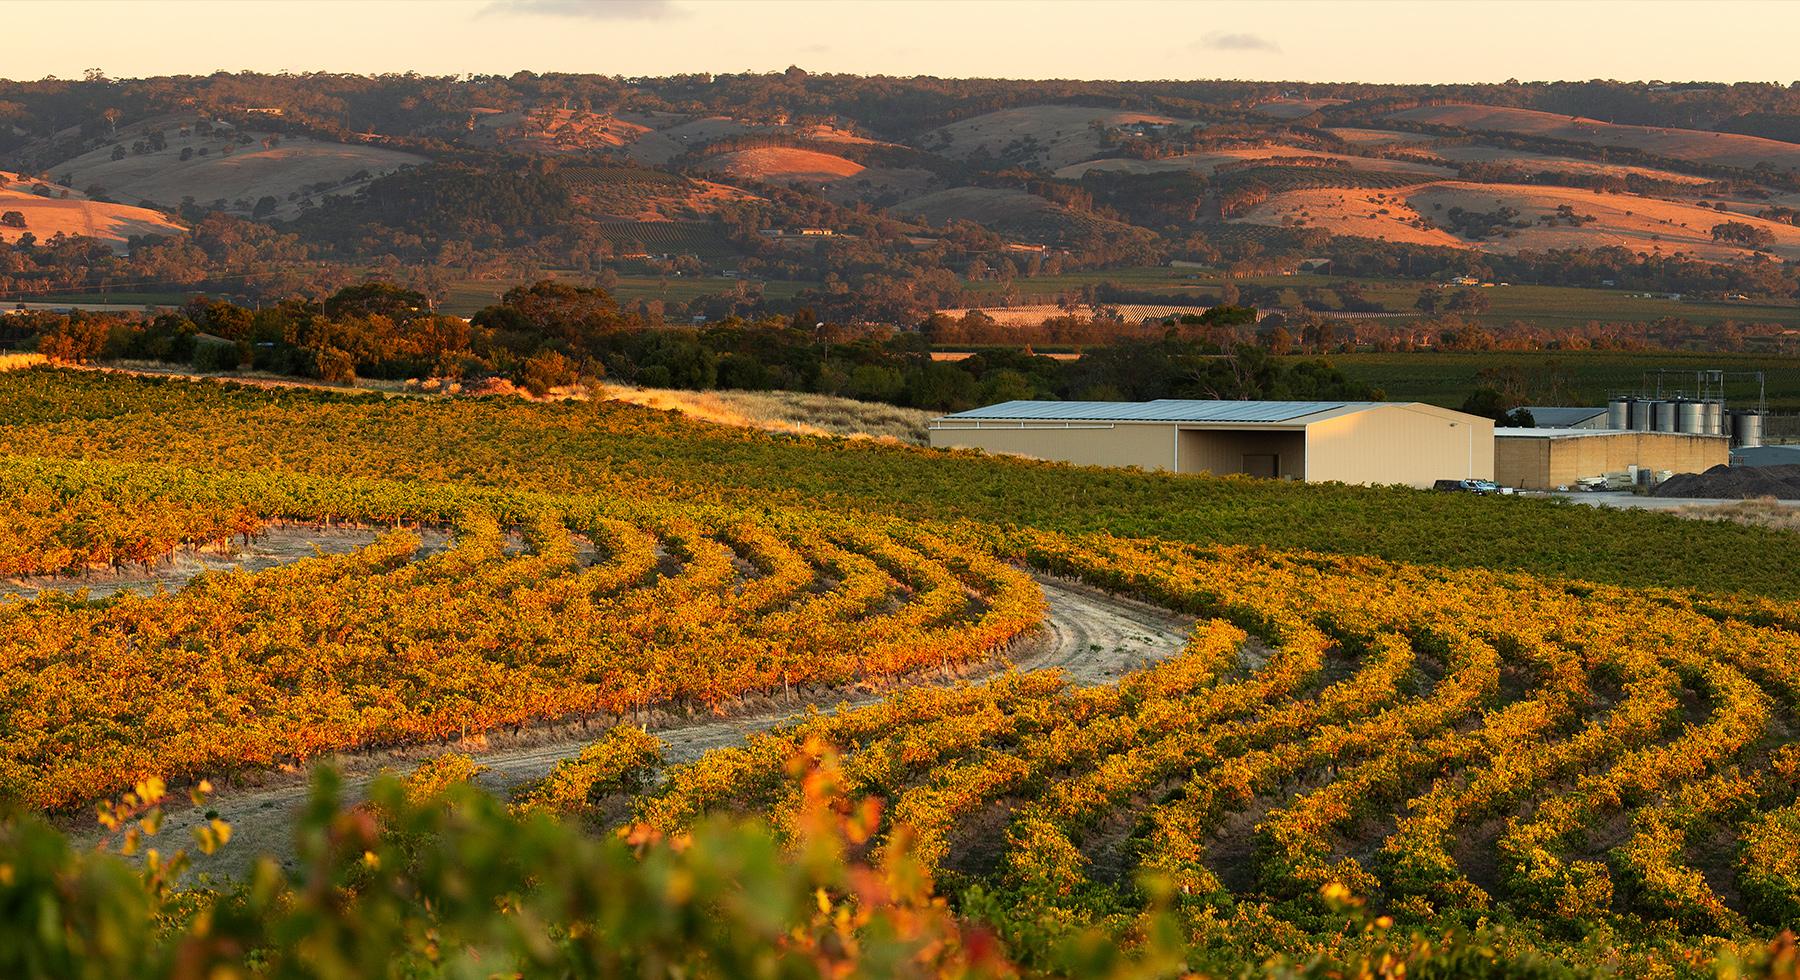 Pirramimma_viticulture-slider2